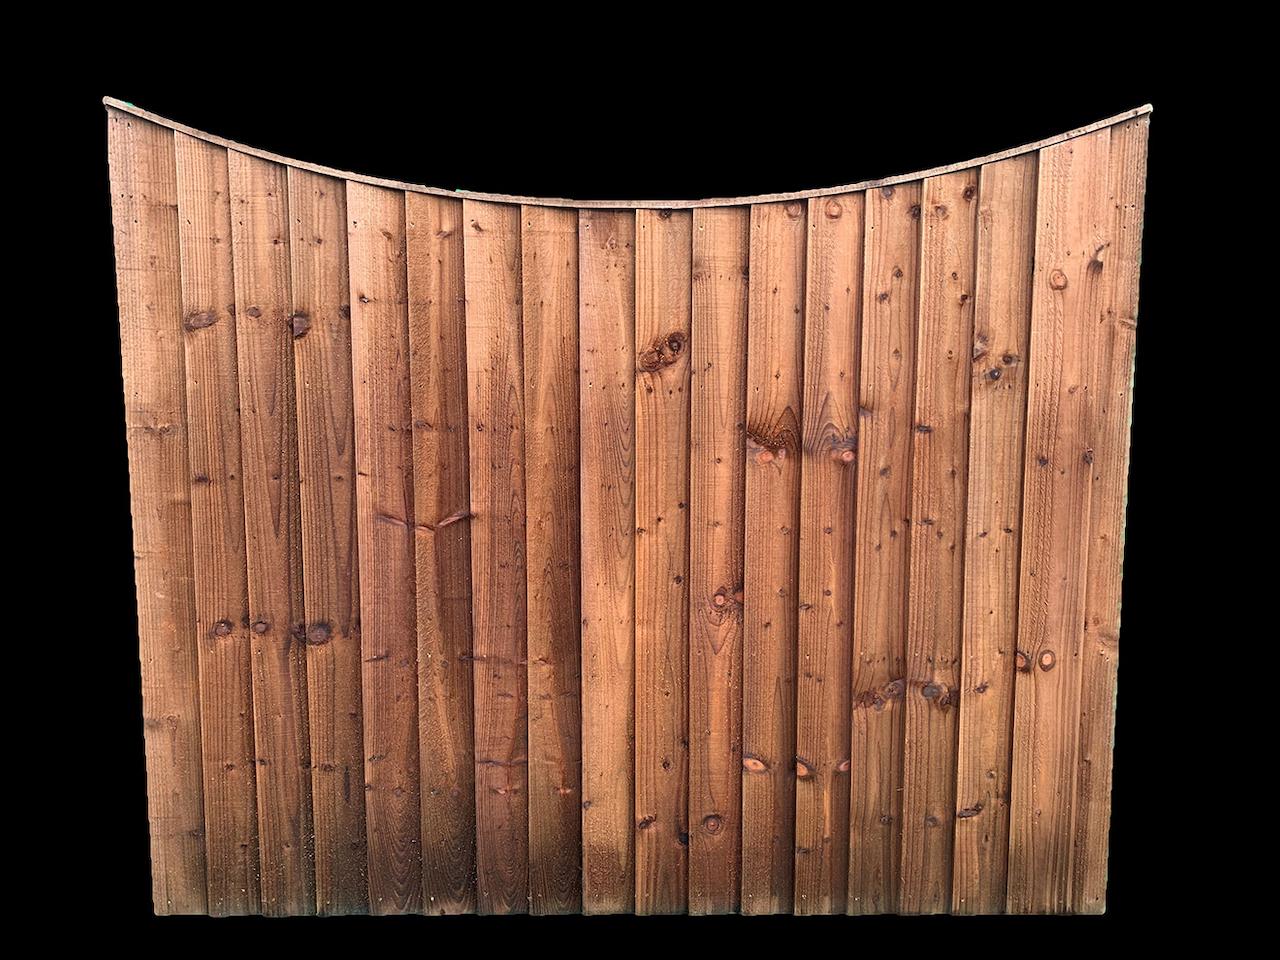 Fencing Panels in Worthington